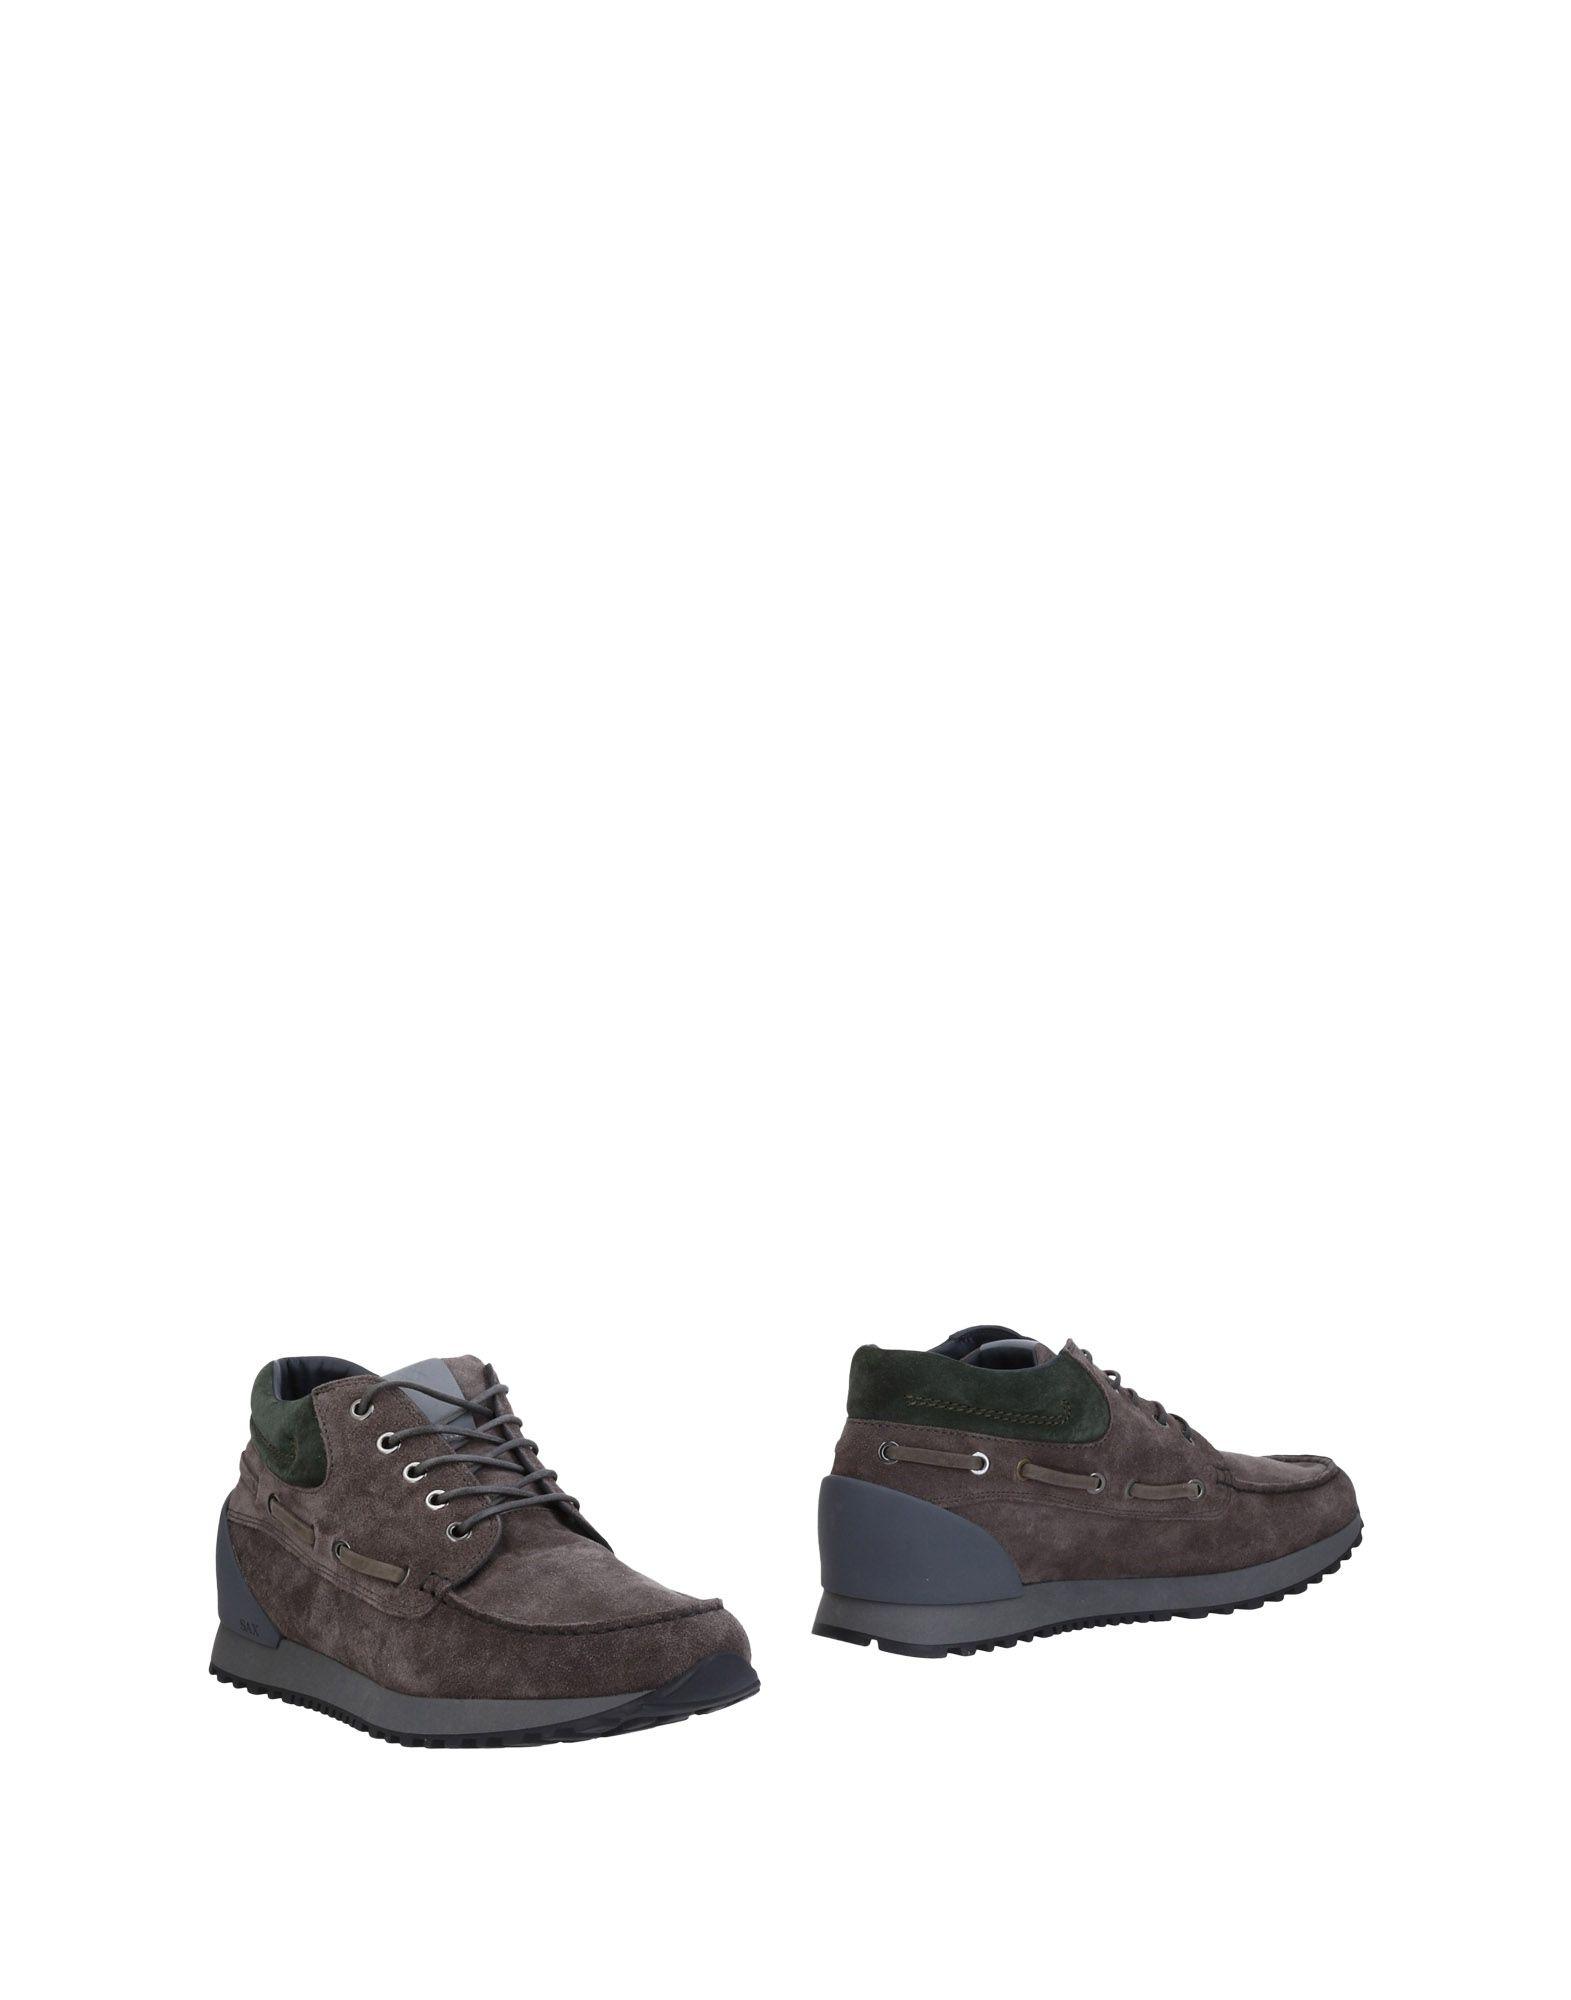 Rabatt echte Schuhe Sax Stiefelette Herren  11459289AD